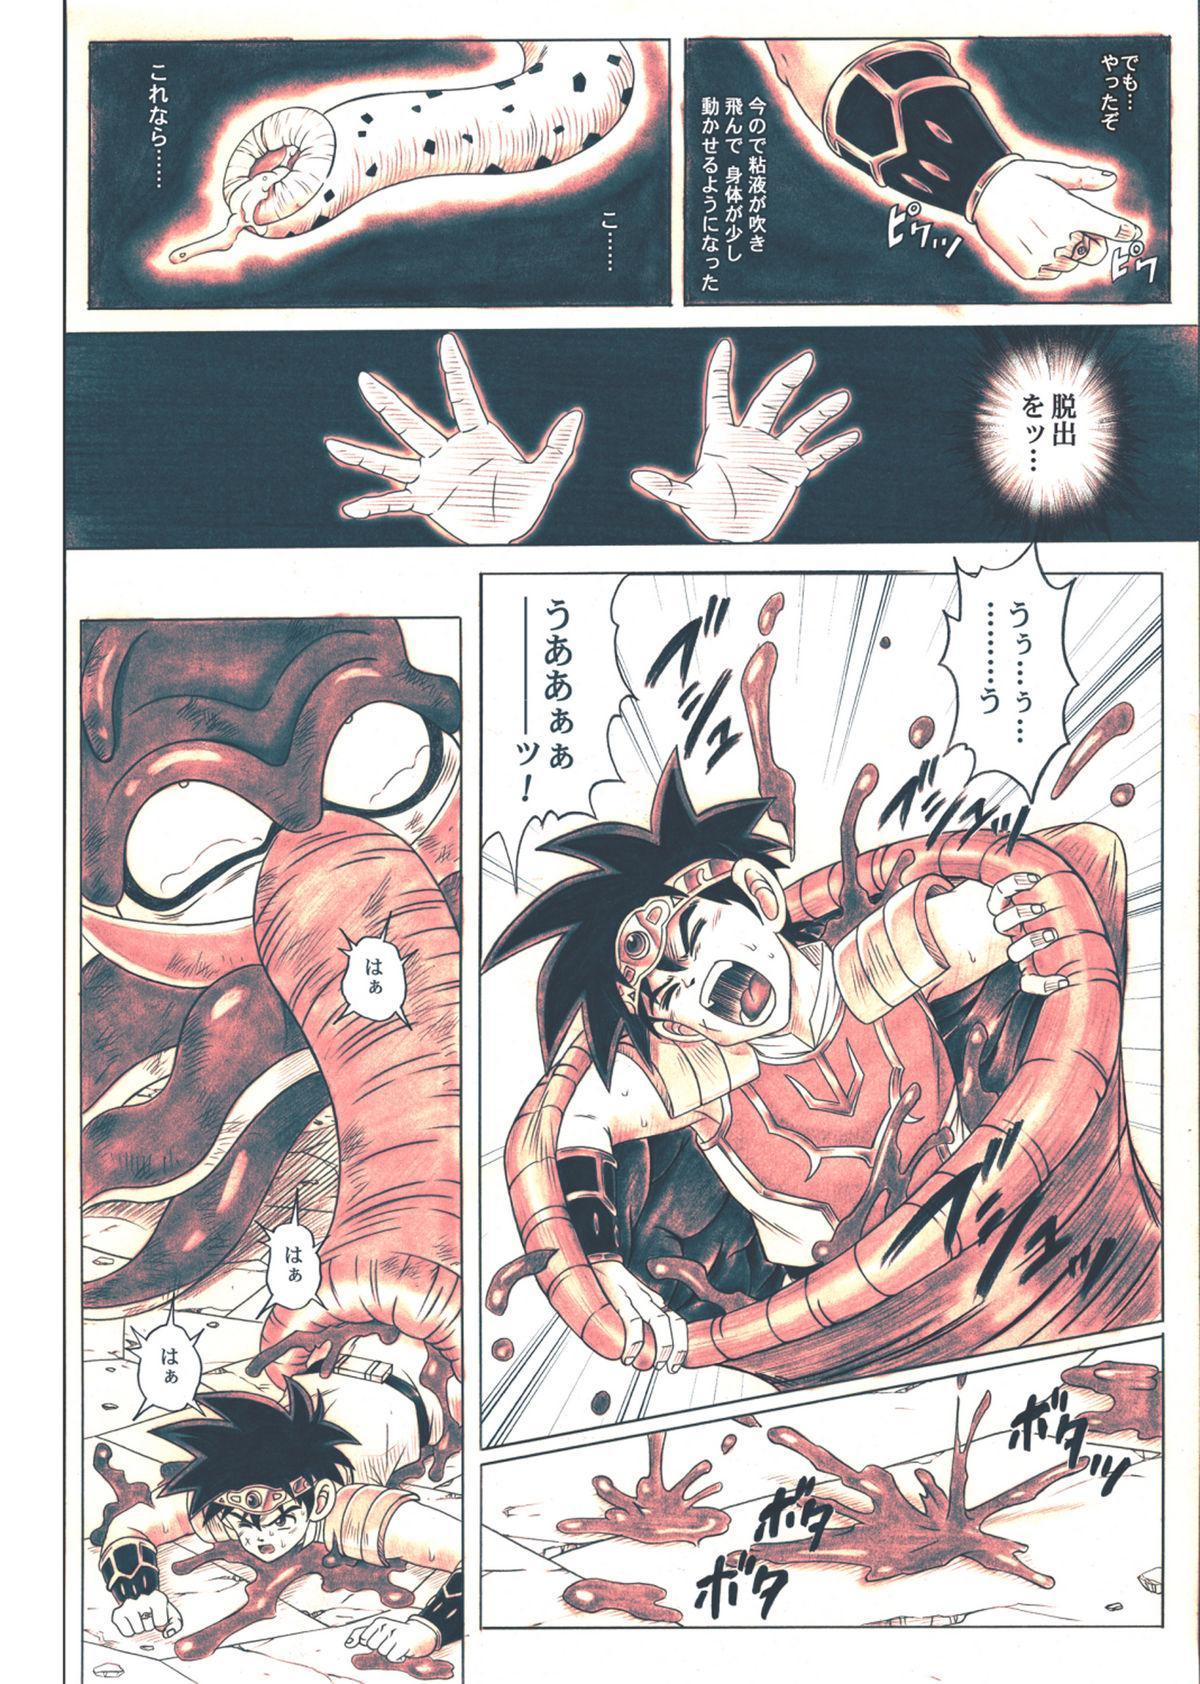 [Cyclone (Reizei, Izumi)] STAR TAC IDO ~Youkuso Haja no Doukutsu he~ Chuuhen Download edition (Dragon Warrior: Dai's Great Adventure) [Digital] 89